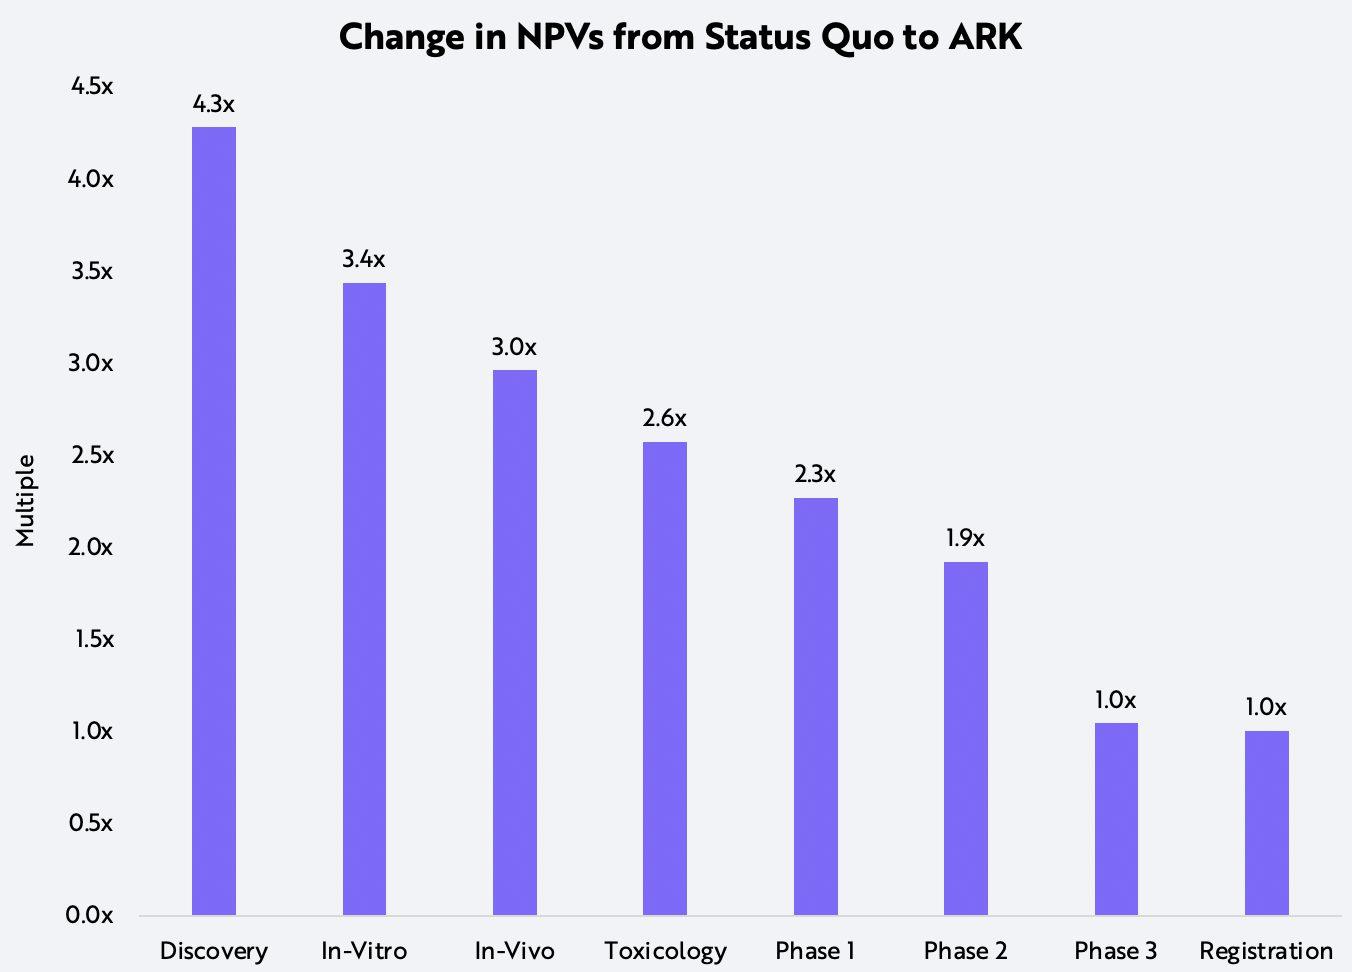 ARK Biopharmaceutical Technology AI NPVs